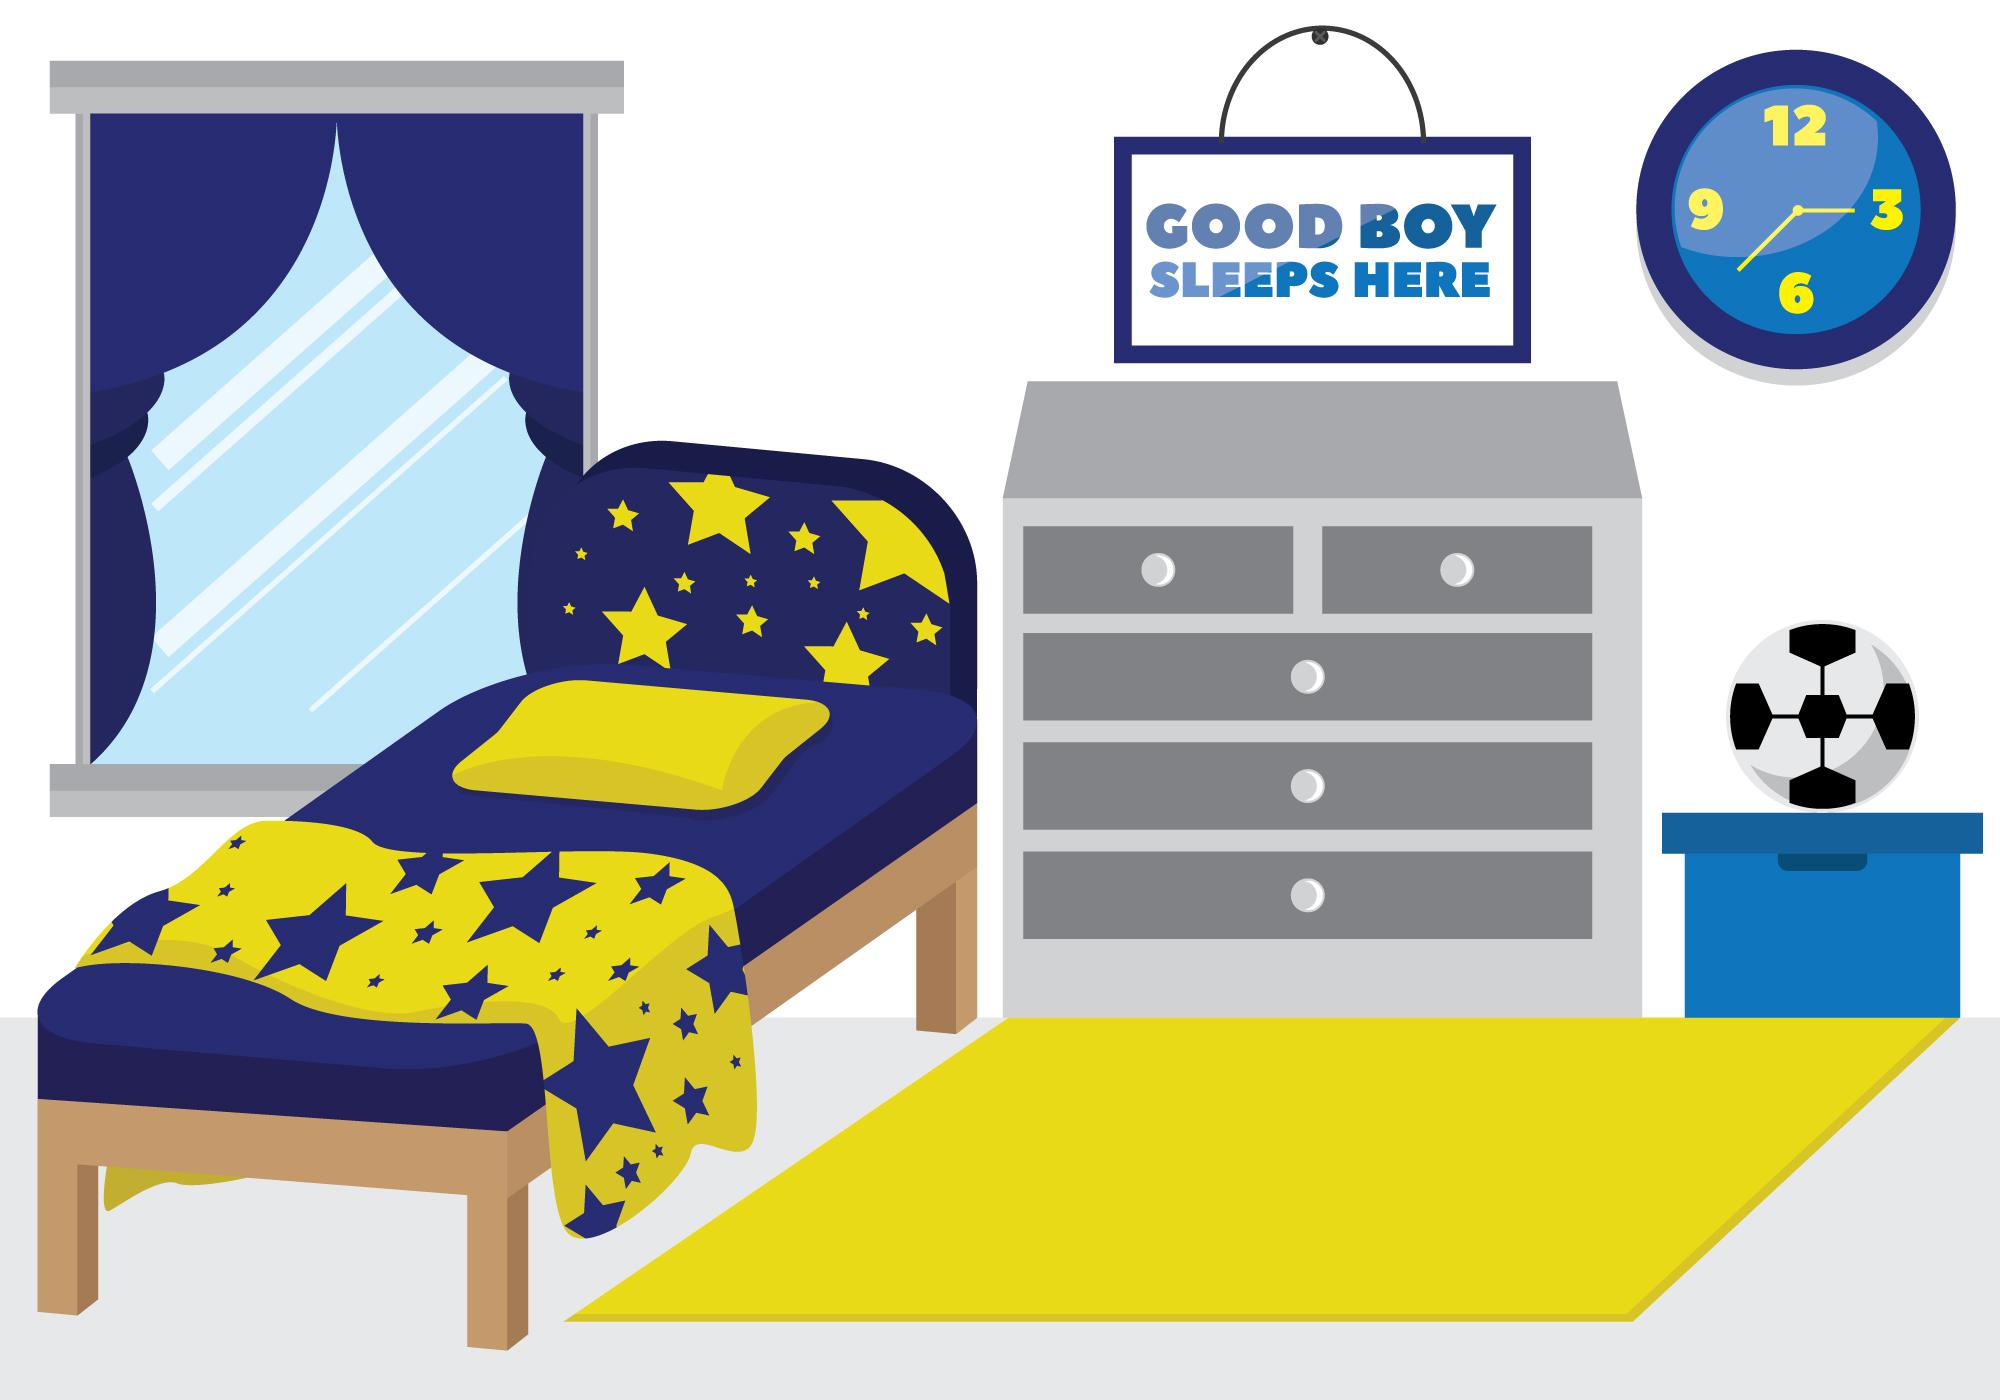 kids room decor boy's style  download free vectors